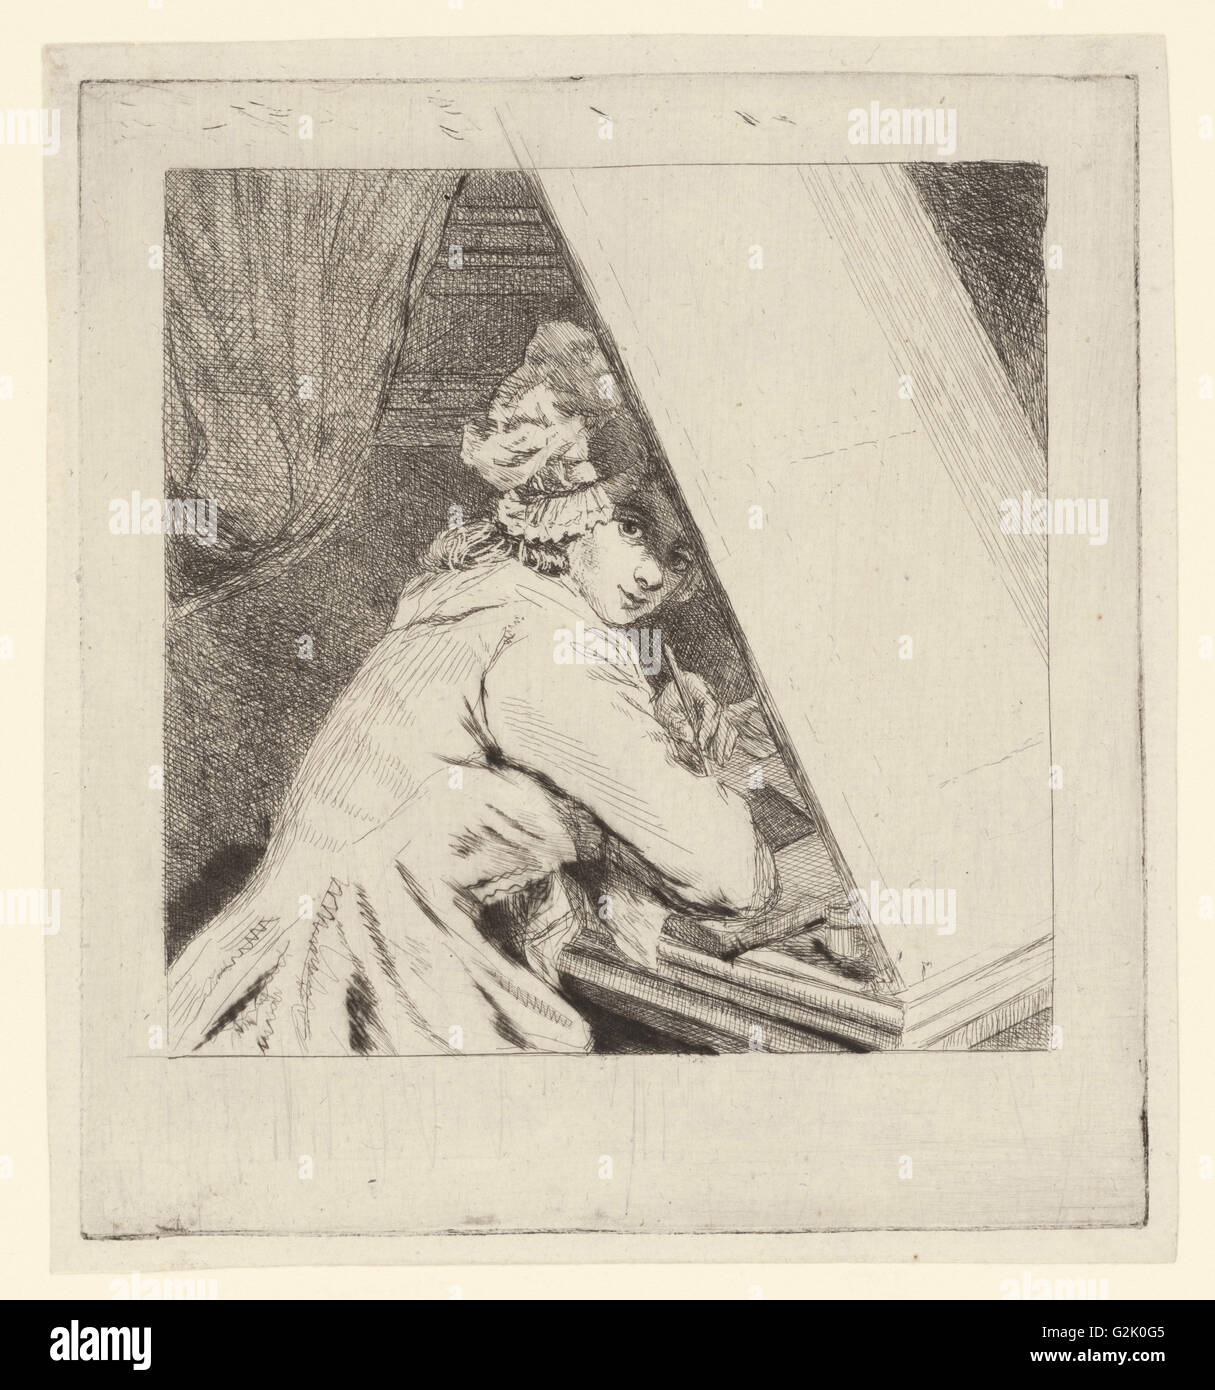 Portrait Marie-Lambertine Coclers, Louis Bernard Coclers, c. 1776 - 1817 - Stock Image